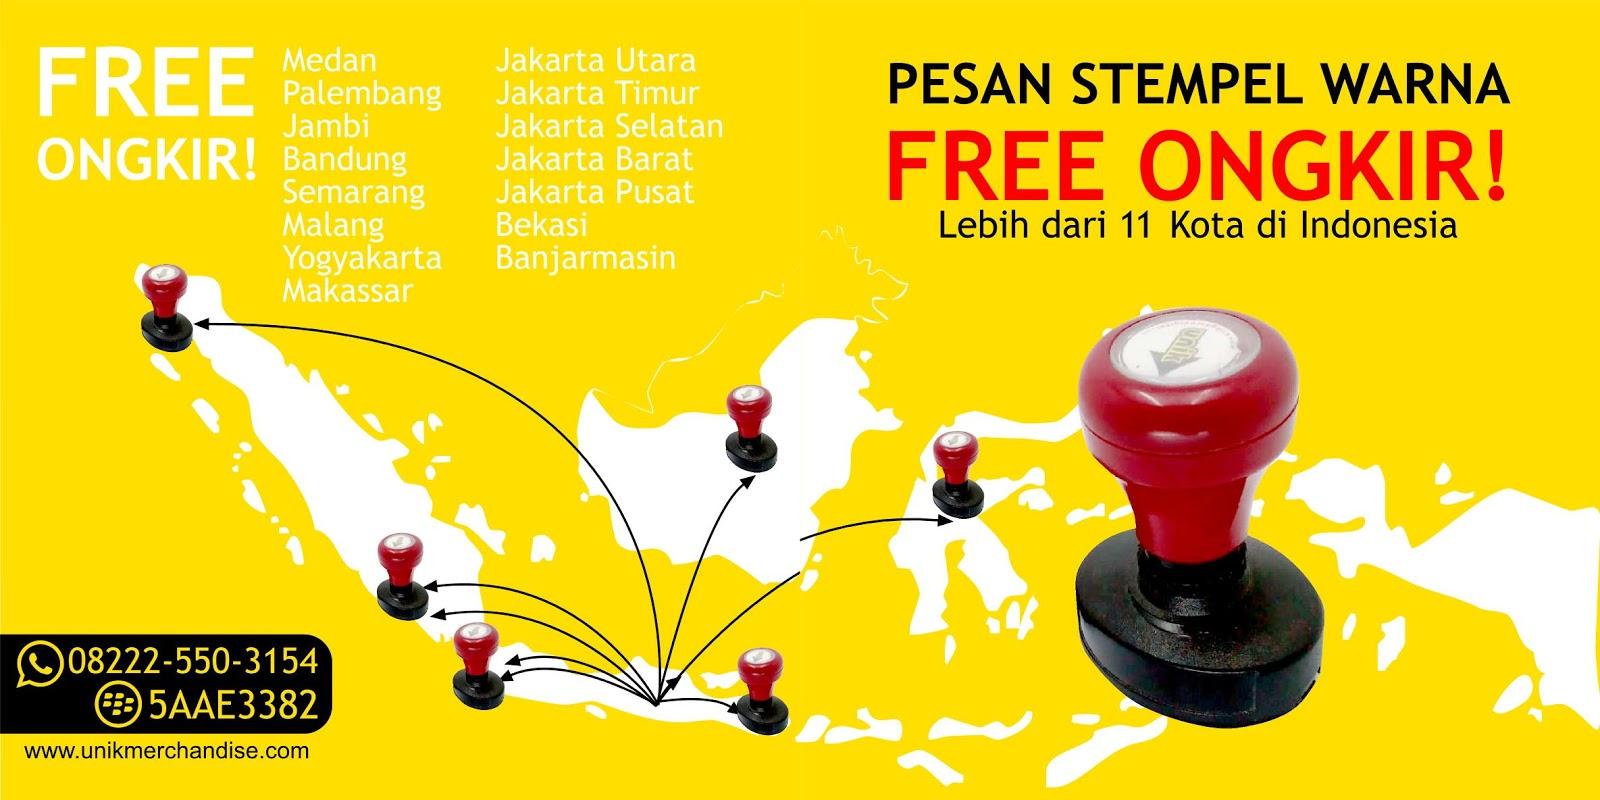 Jual Stempel Lampung Free Ongkir 082225503154 Unik Jika Anda Memesan Via Offline Atau Datang Langsung Ke Tempat Kami Maka Dapatkan